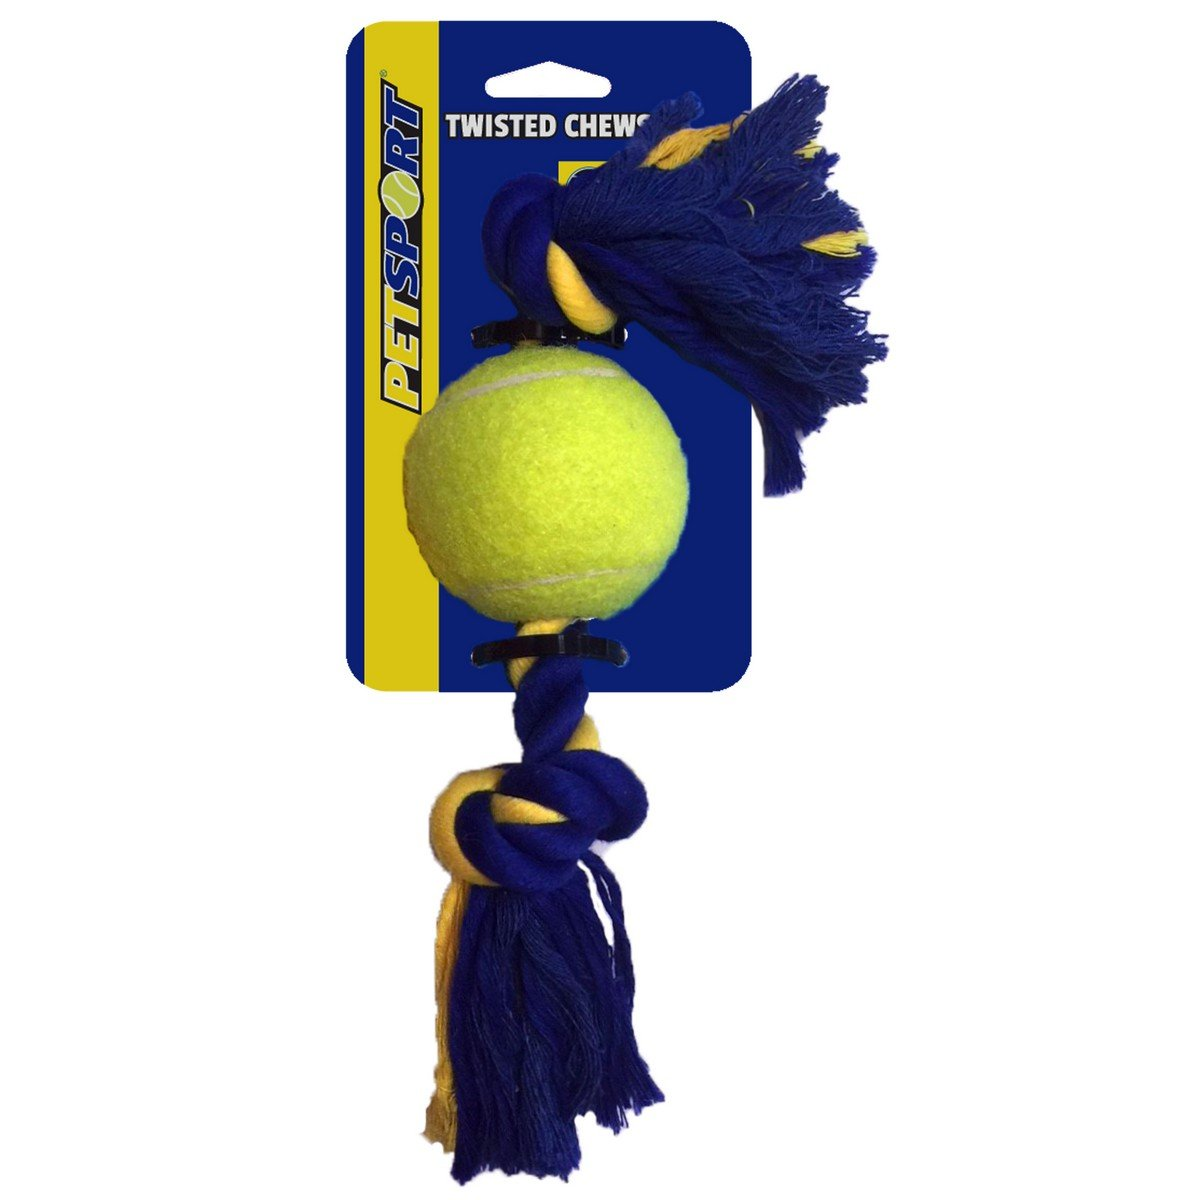 Imagem de Agradi 2 Knot Cotton Rope with Tuff Ball 6cm